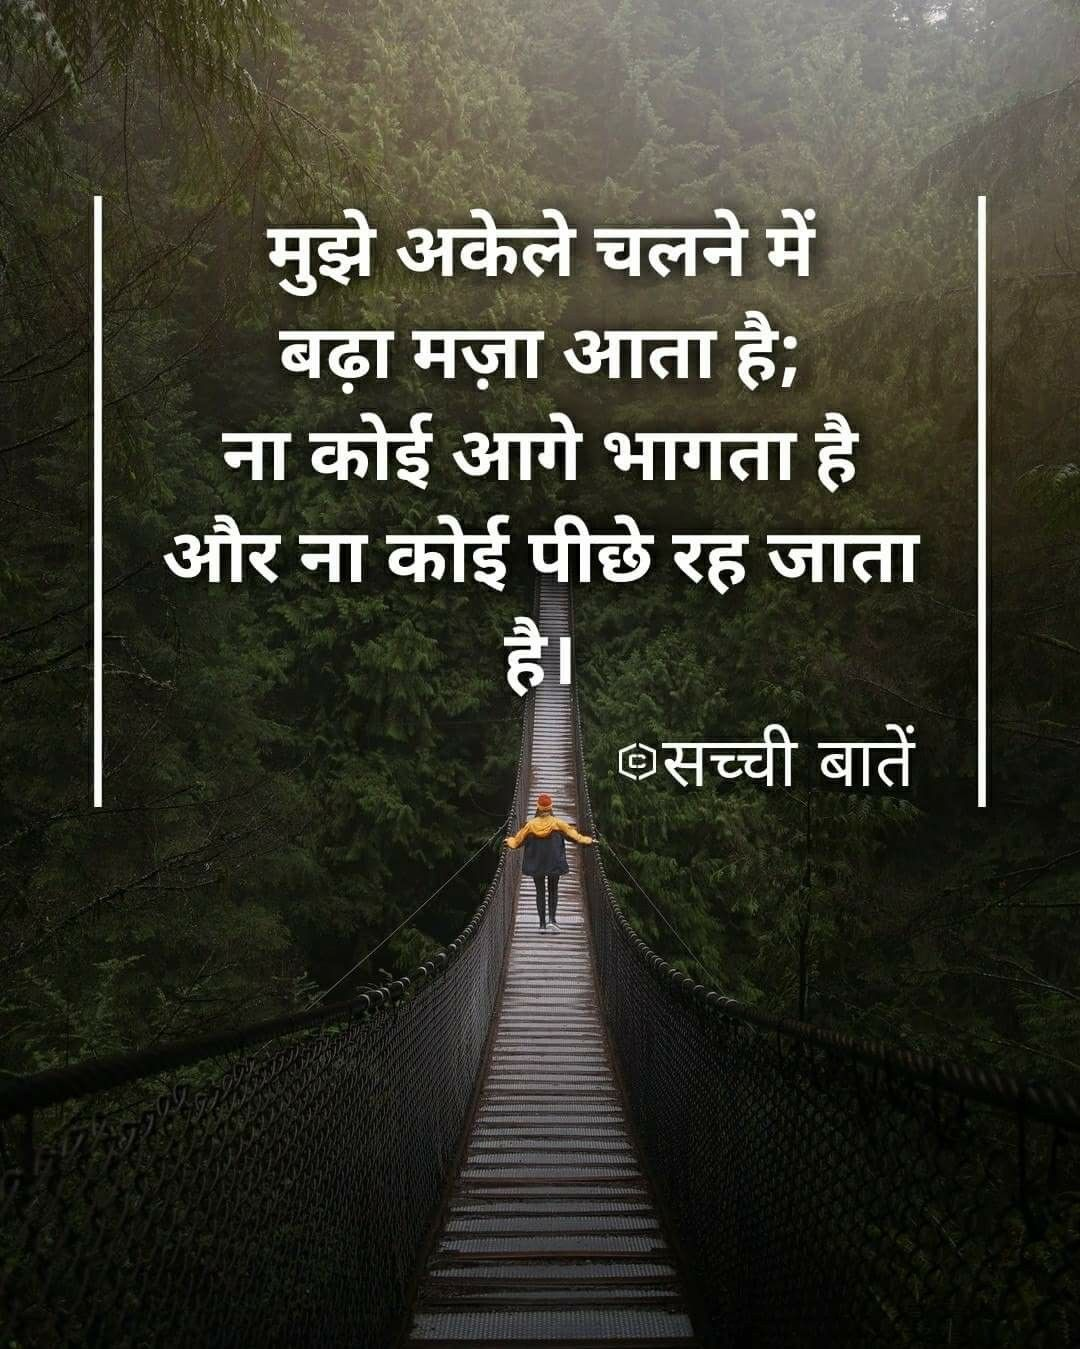 Positive Attitude Quotes Marathi: Pin By Pragnesh Patel On Heart Touching Shayari